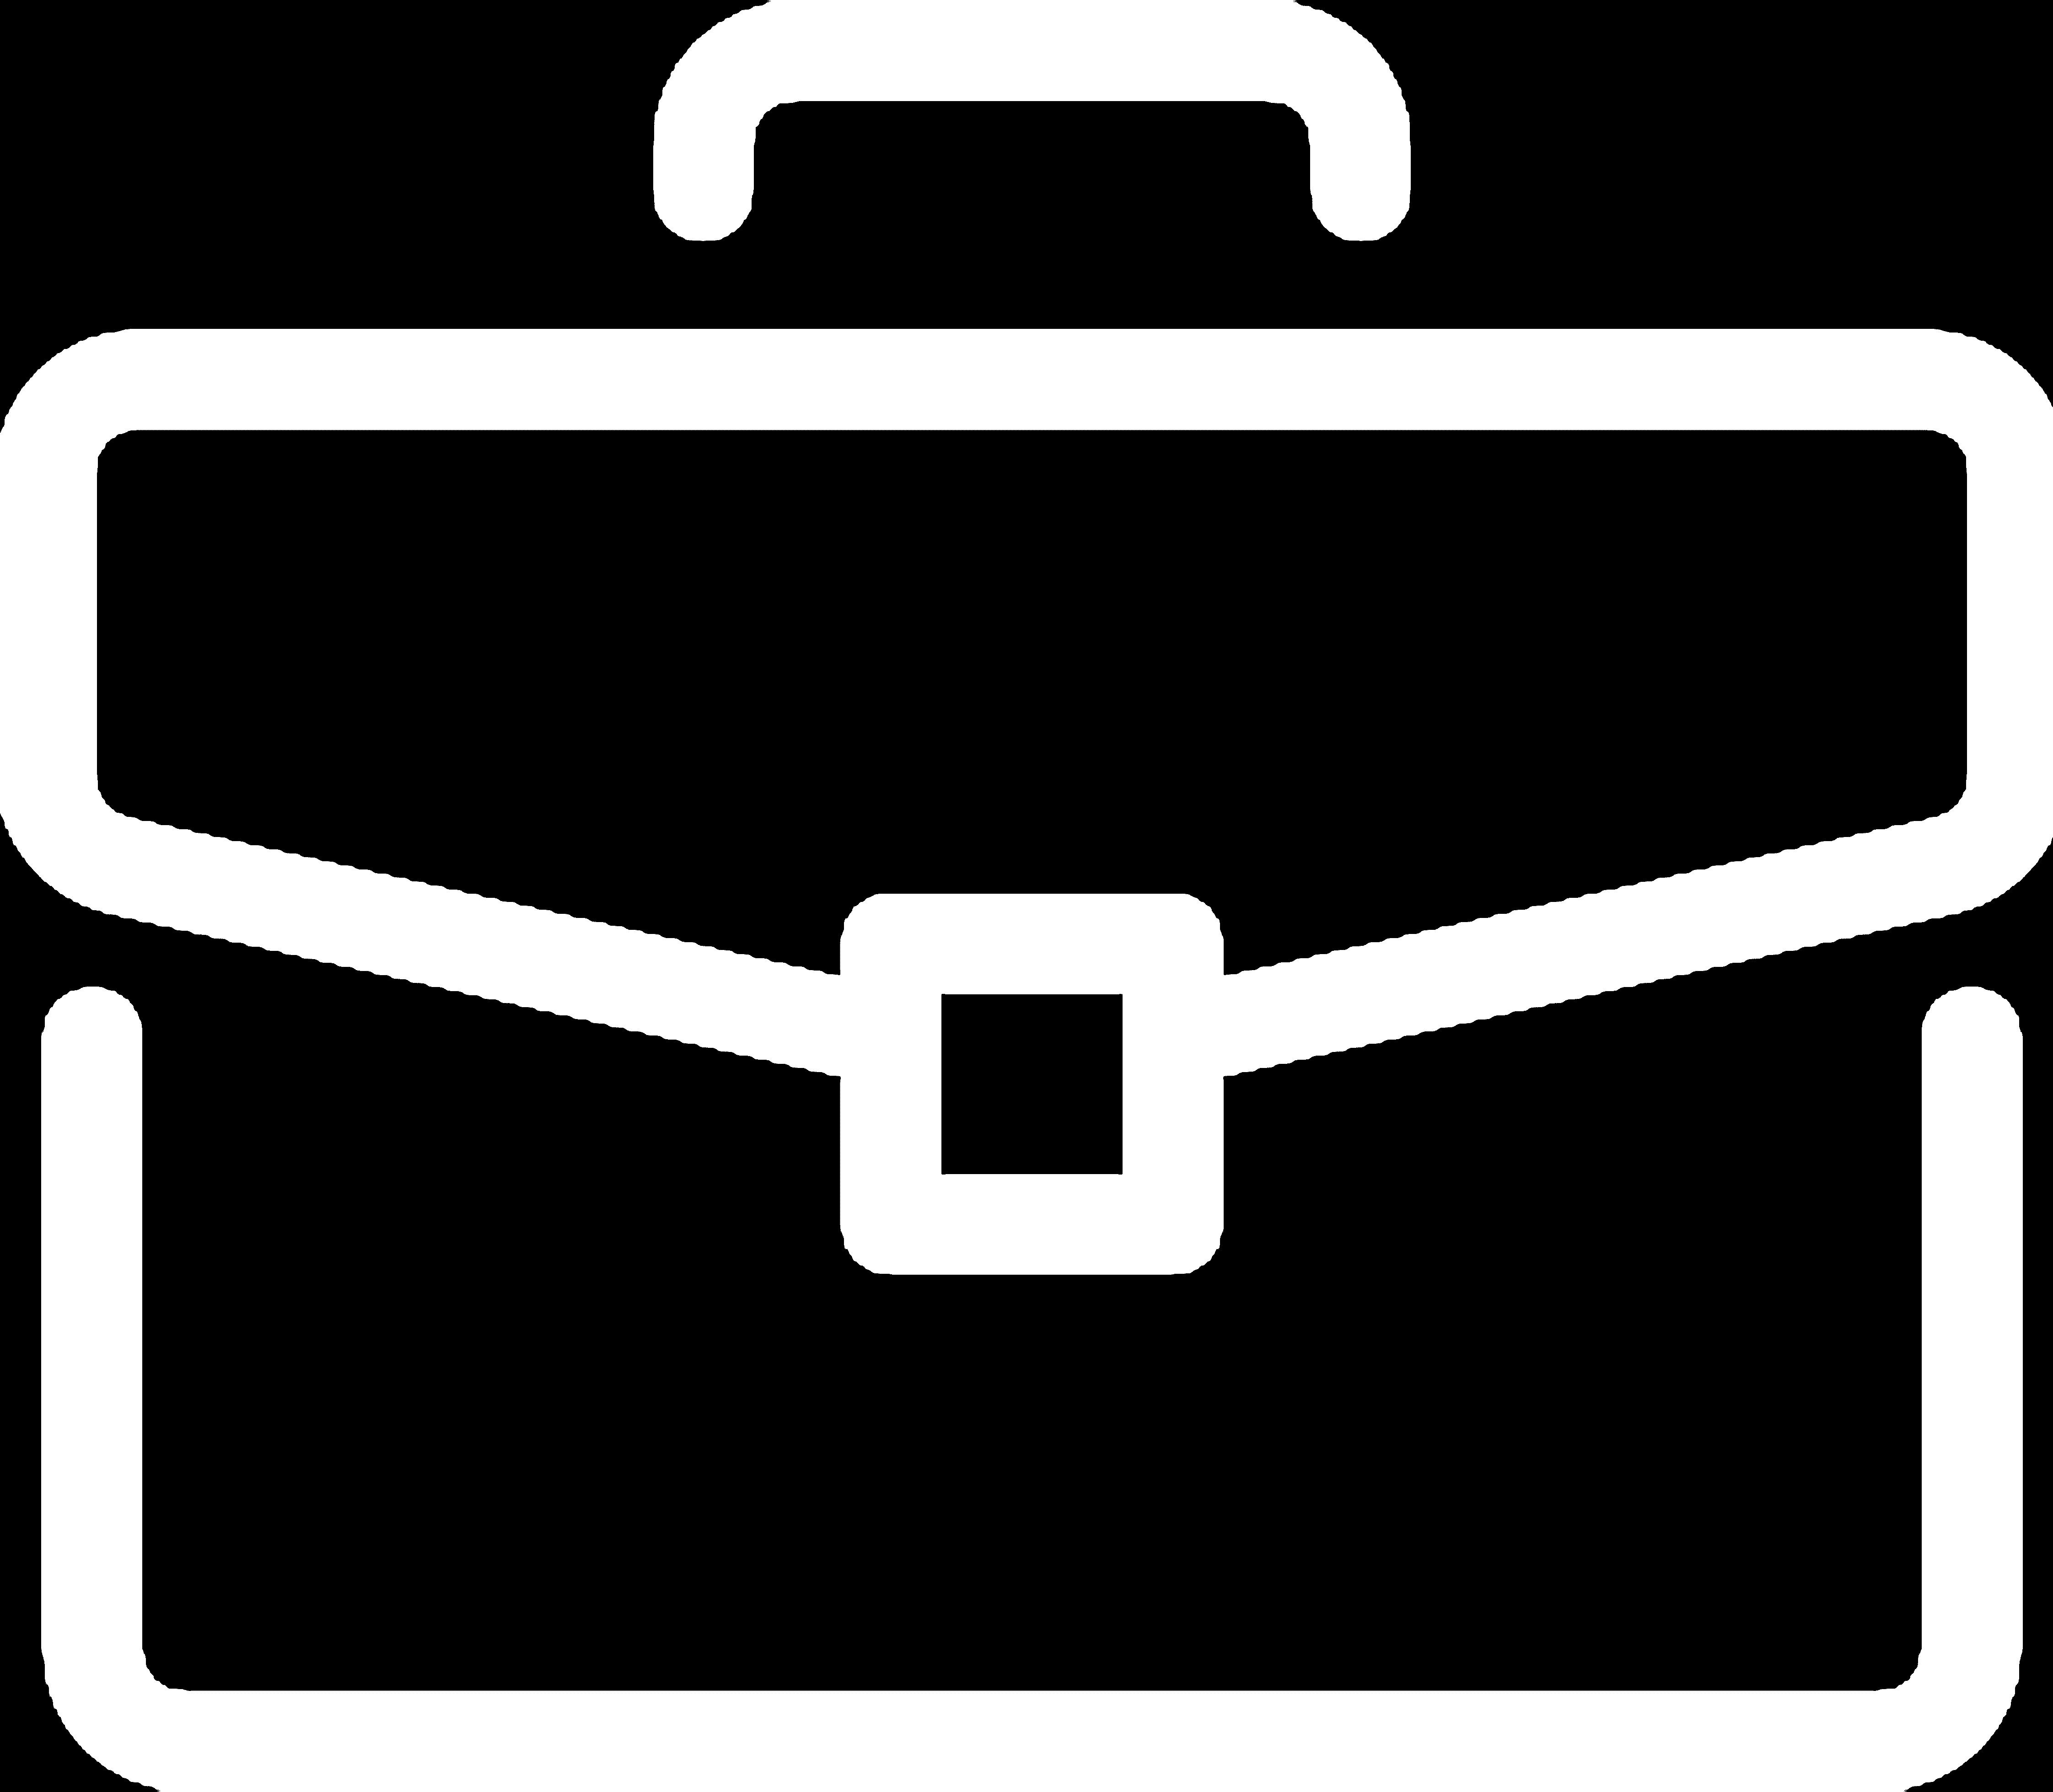 icone 18